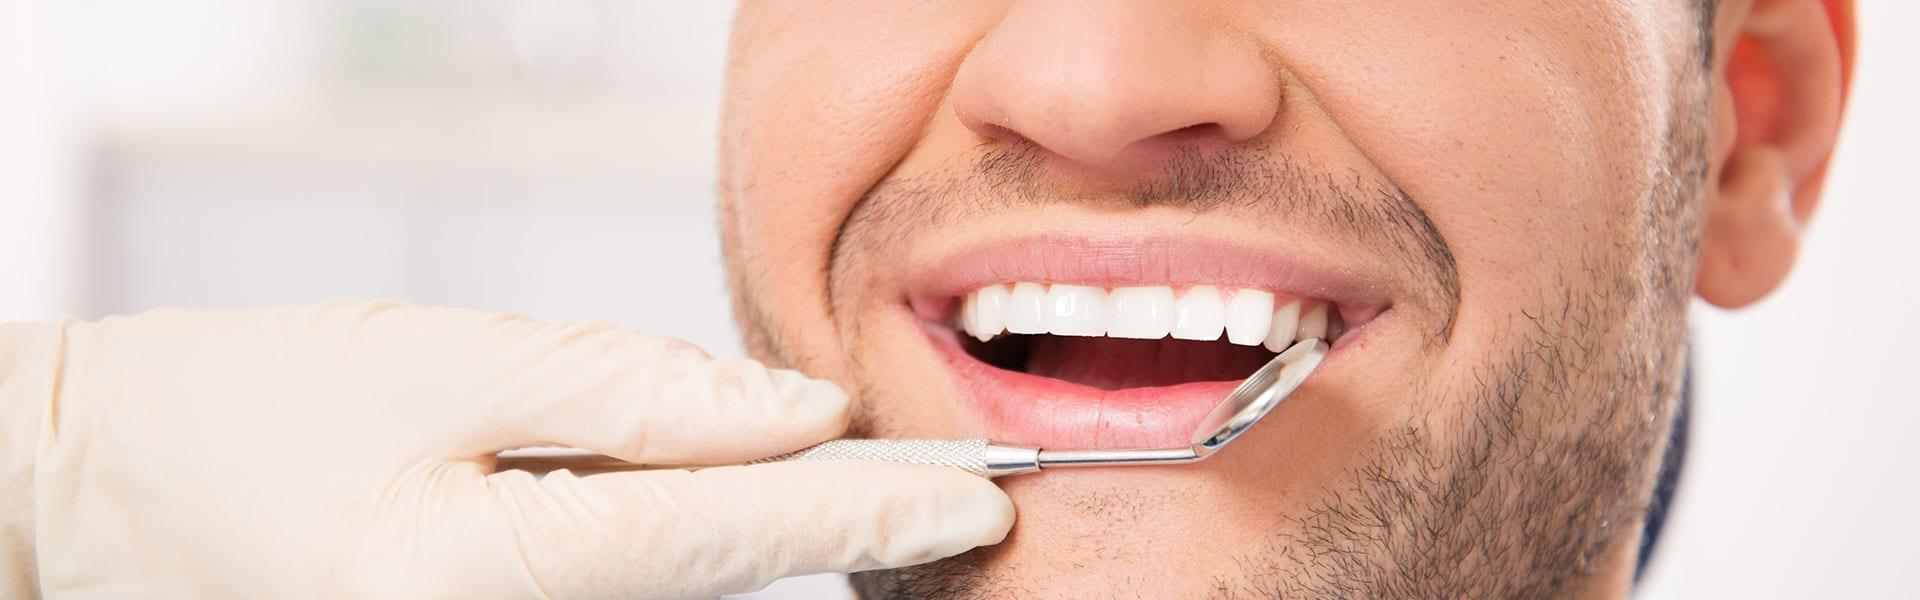 Orthodontics Jaw Surgery